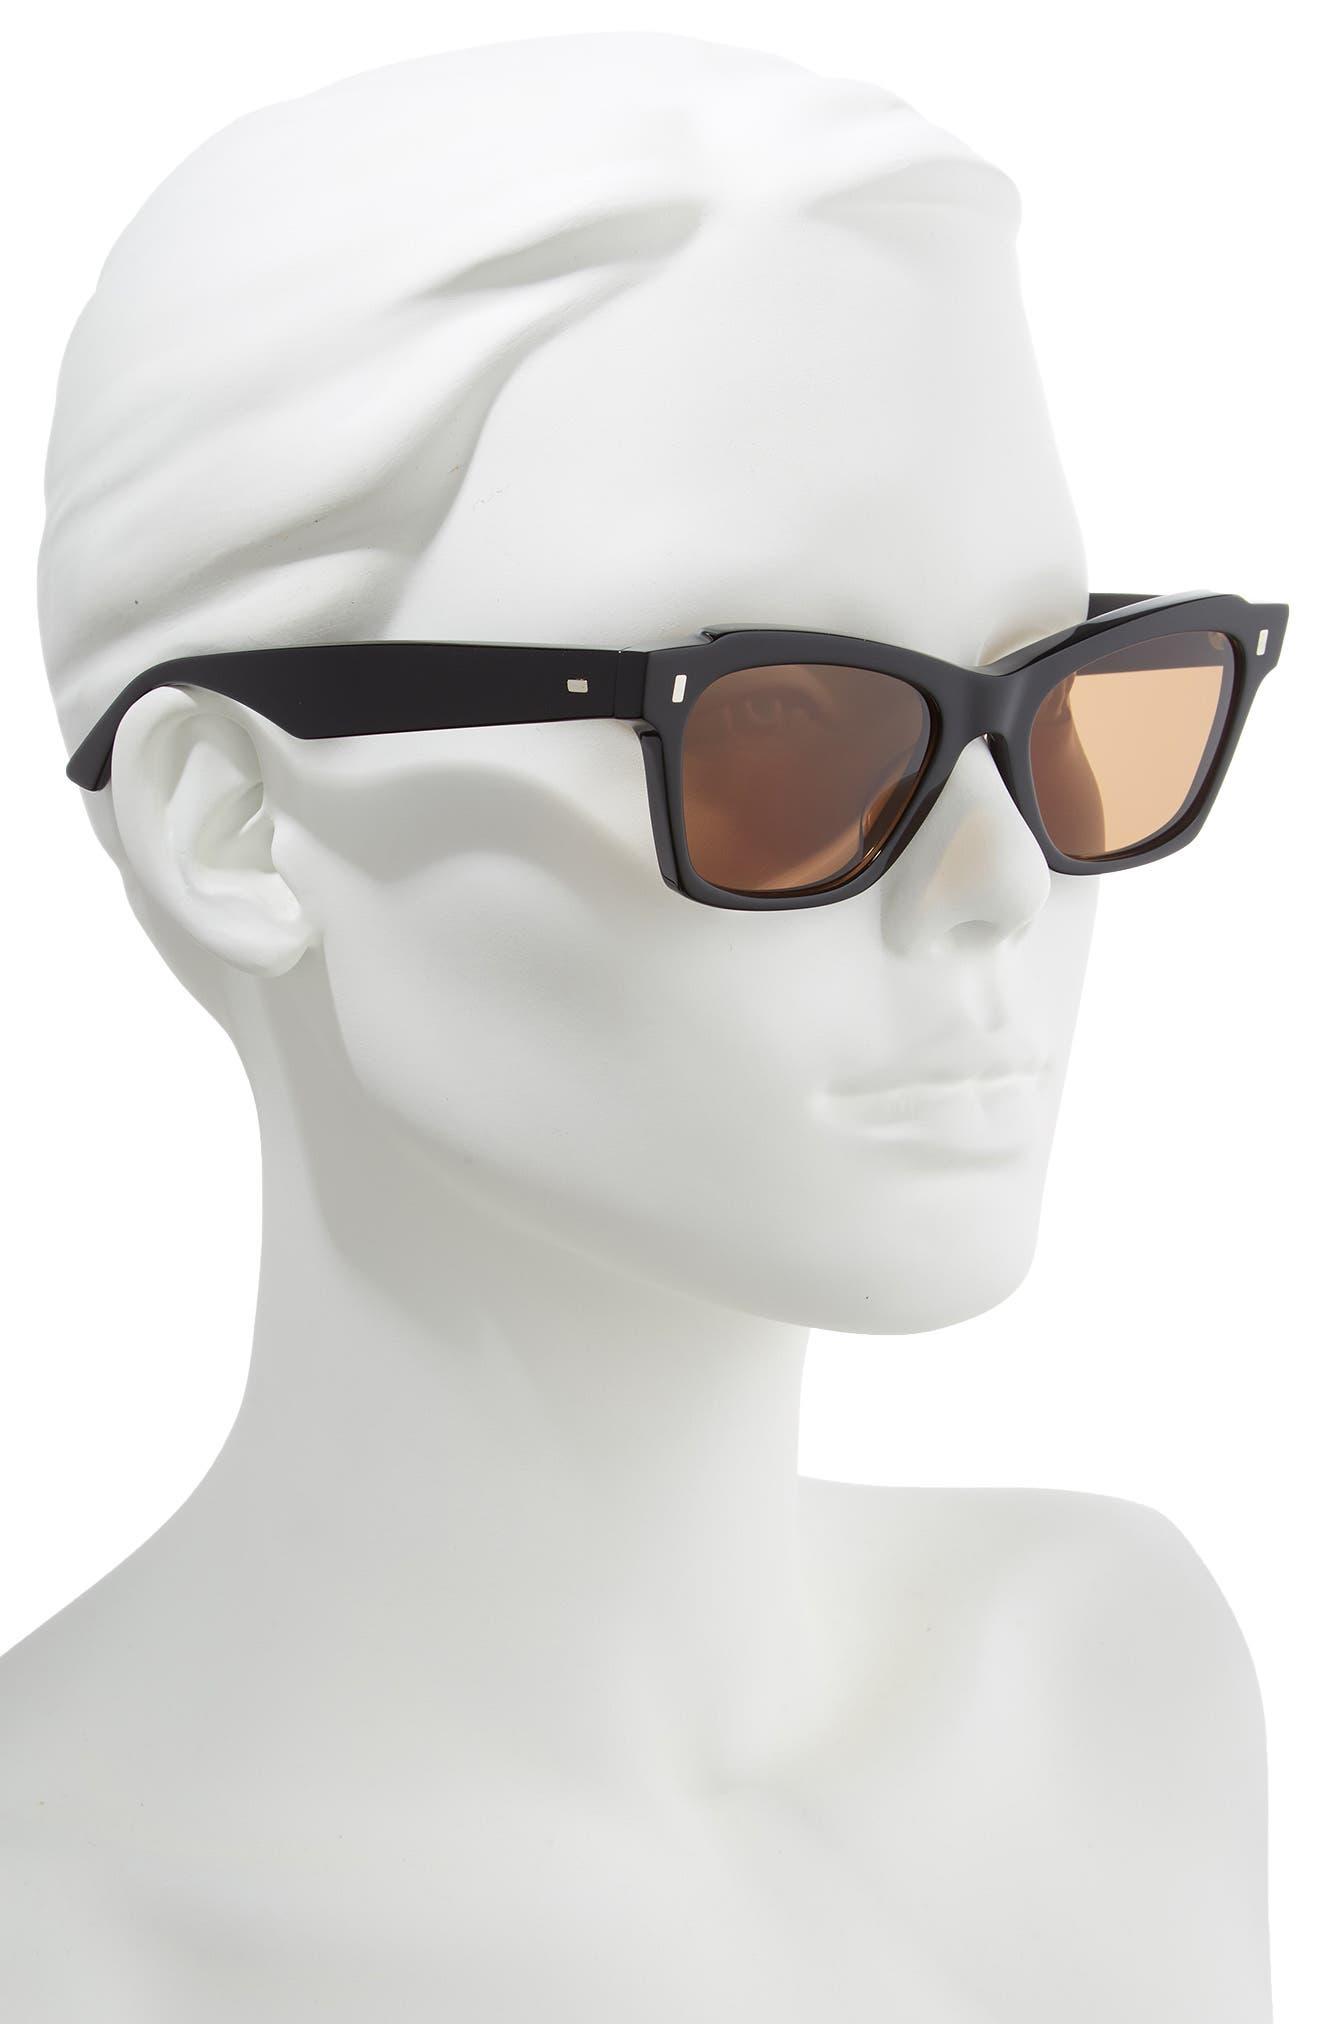 52mm Rectangle Cat Eye Sunglasses,                             Alternate thumbnail 2, color,                             BLACK